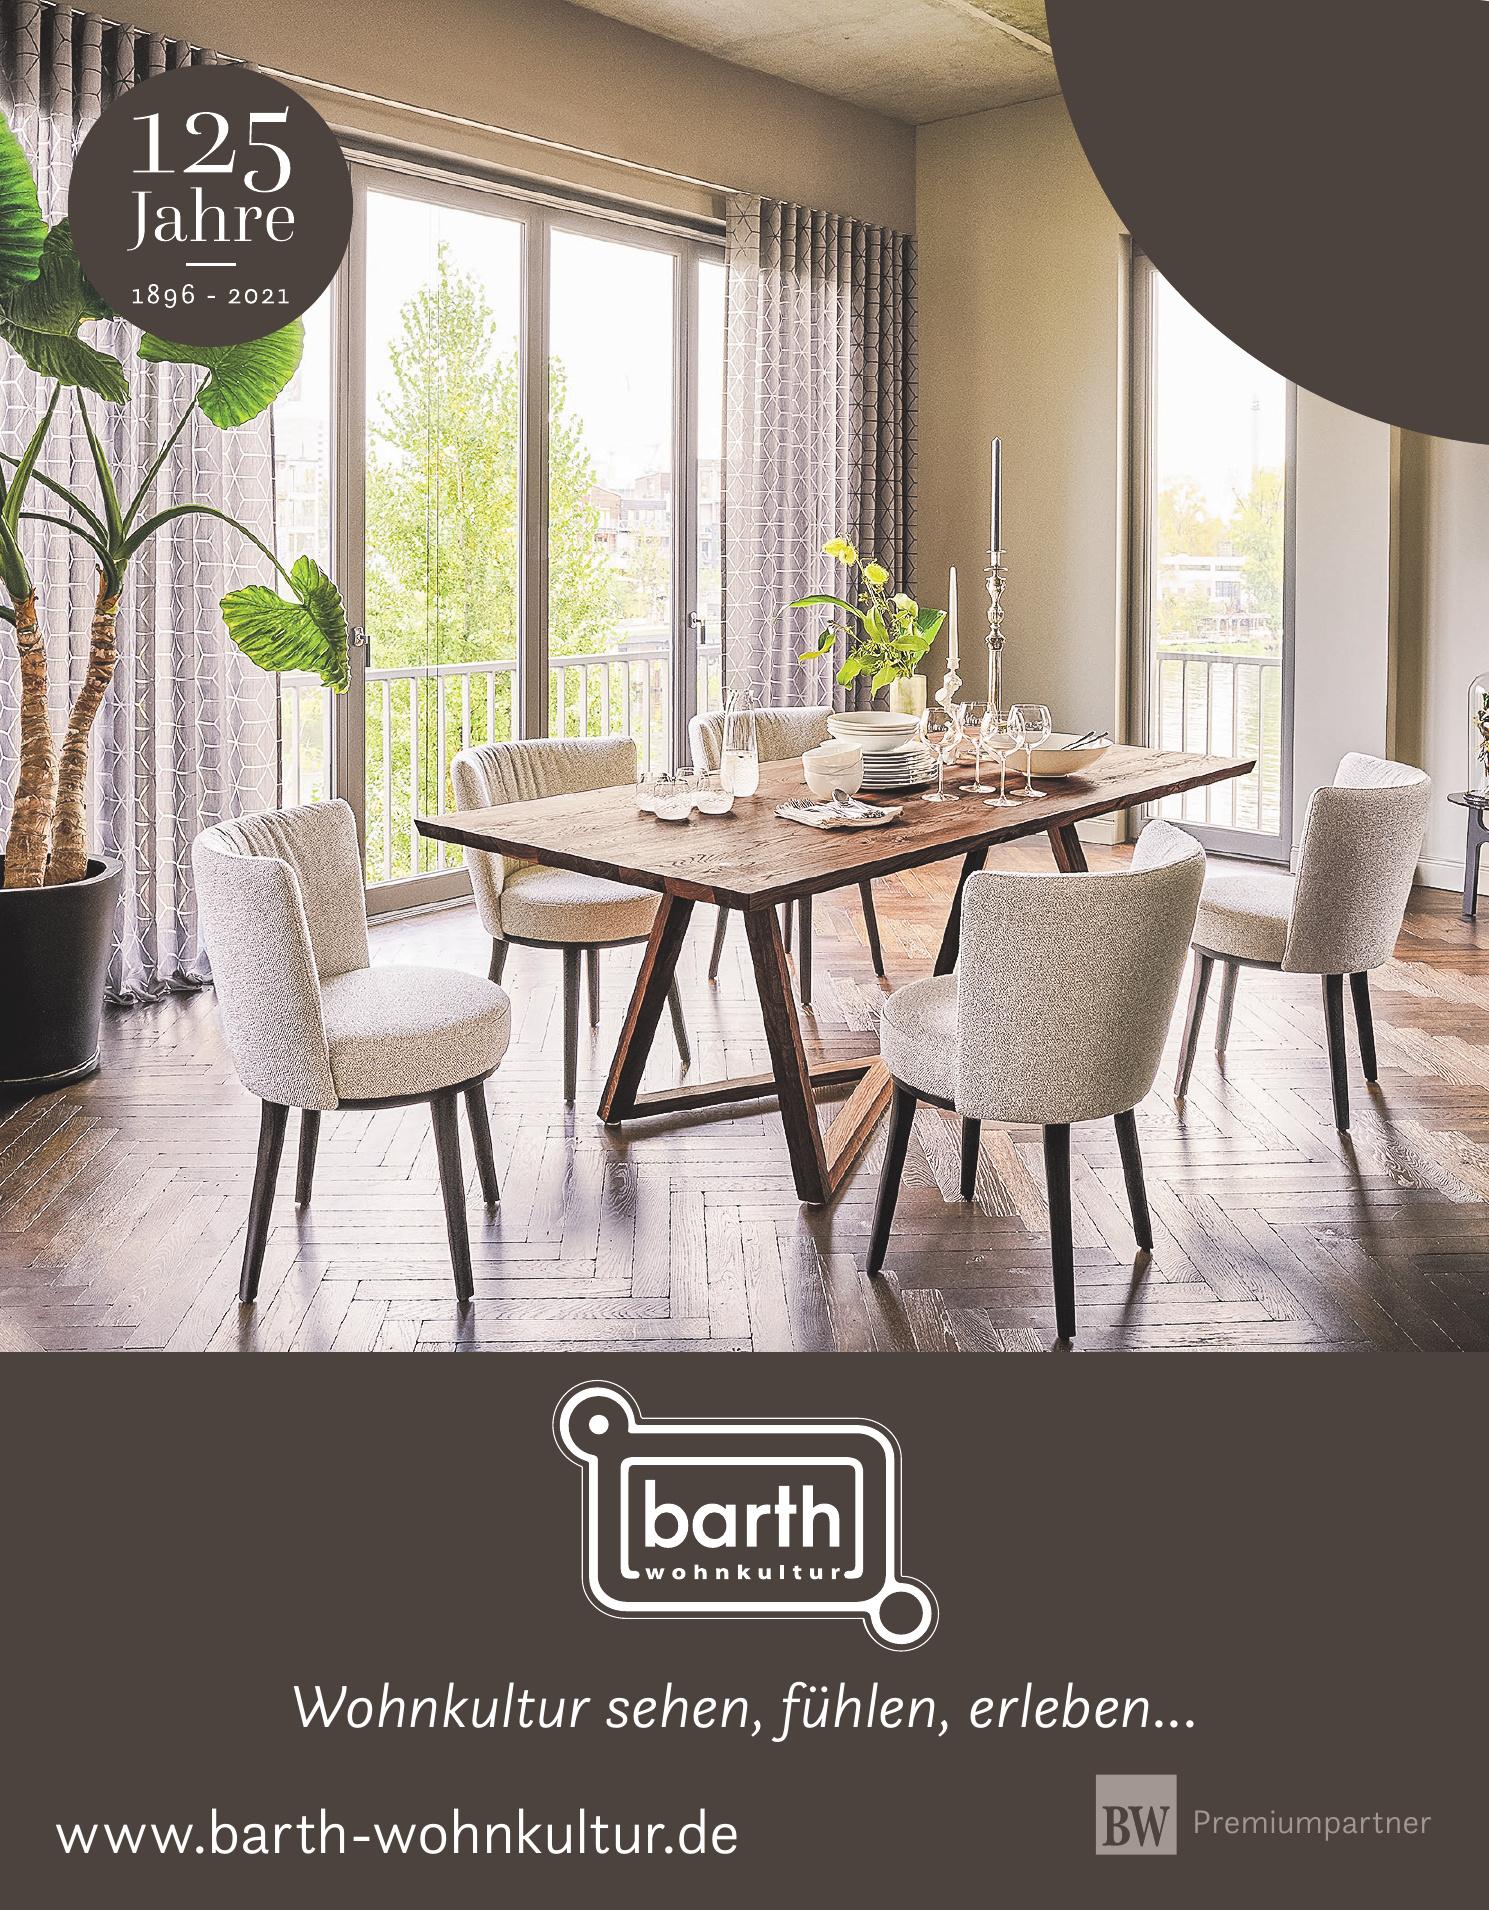 Barth Wohnkultur